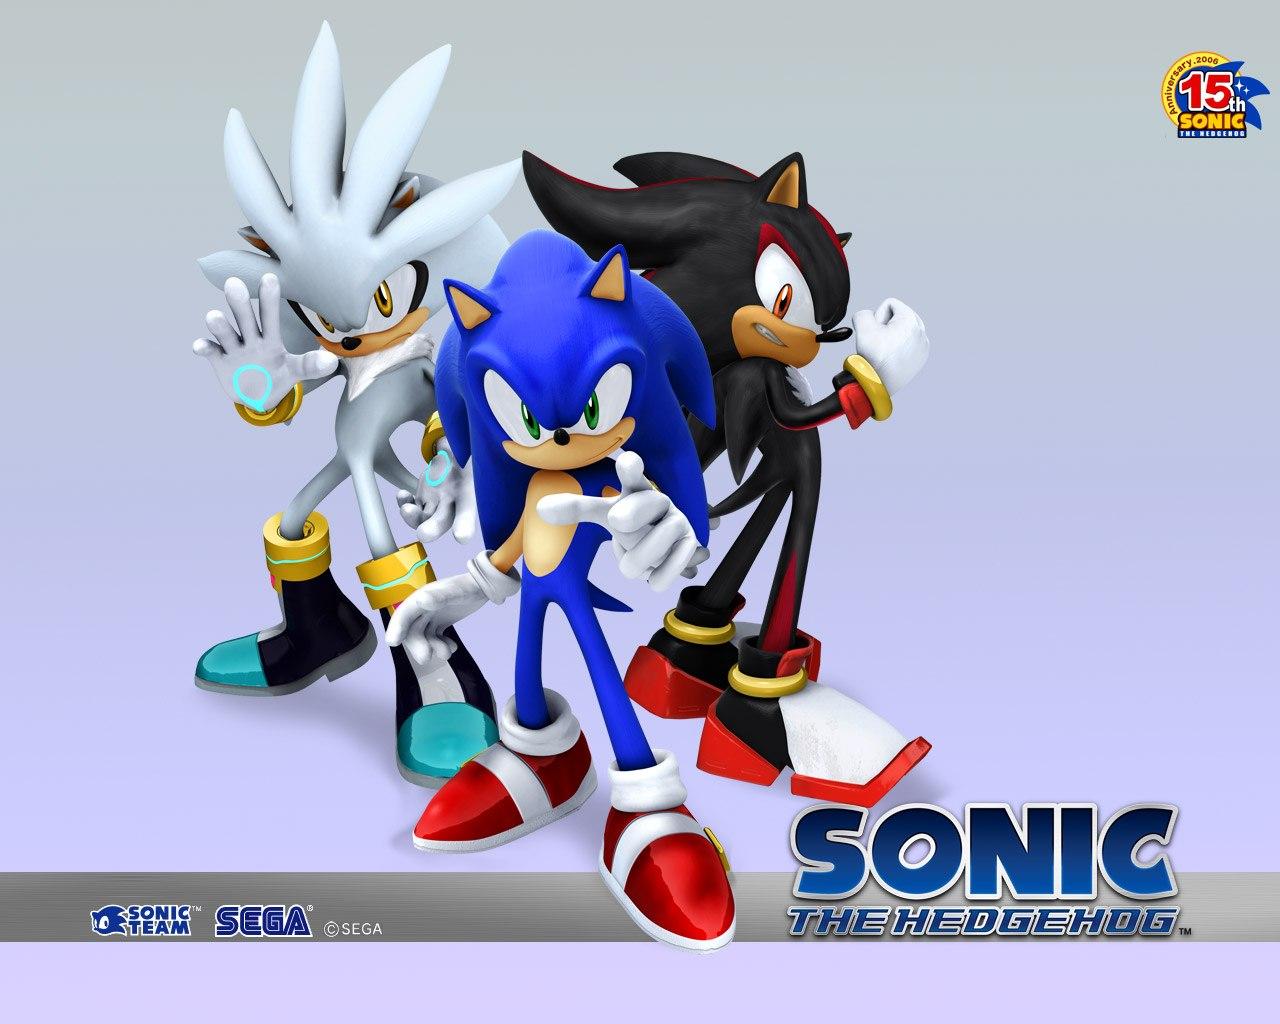 SONICS Sonic the Hedgehog Photo